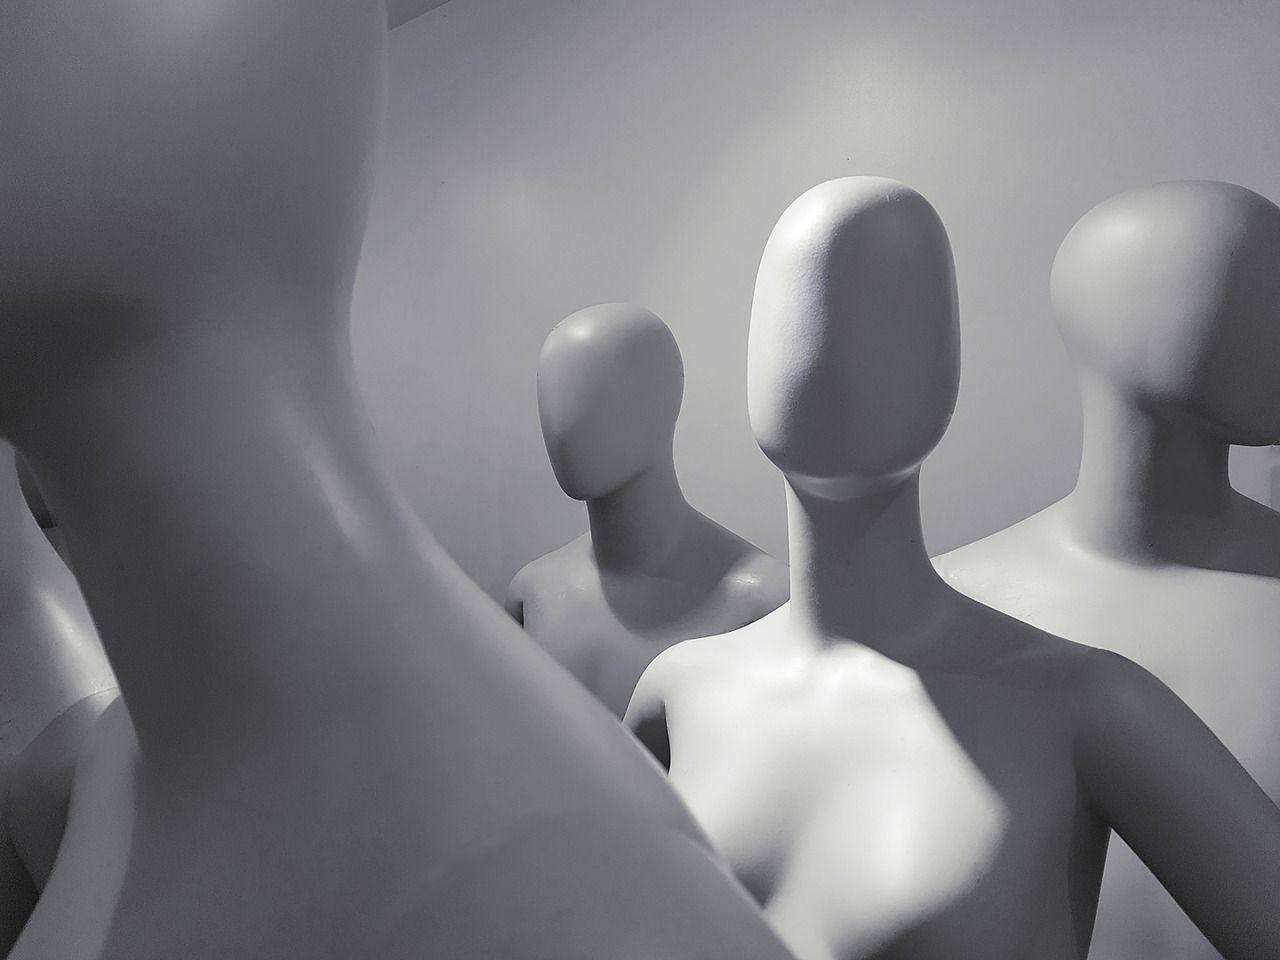 דימוי גוף גברי